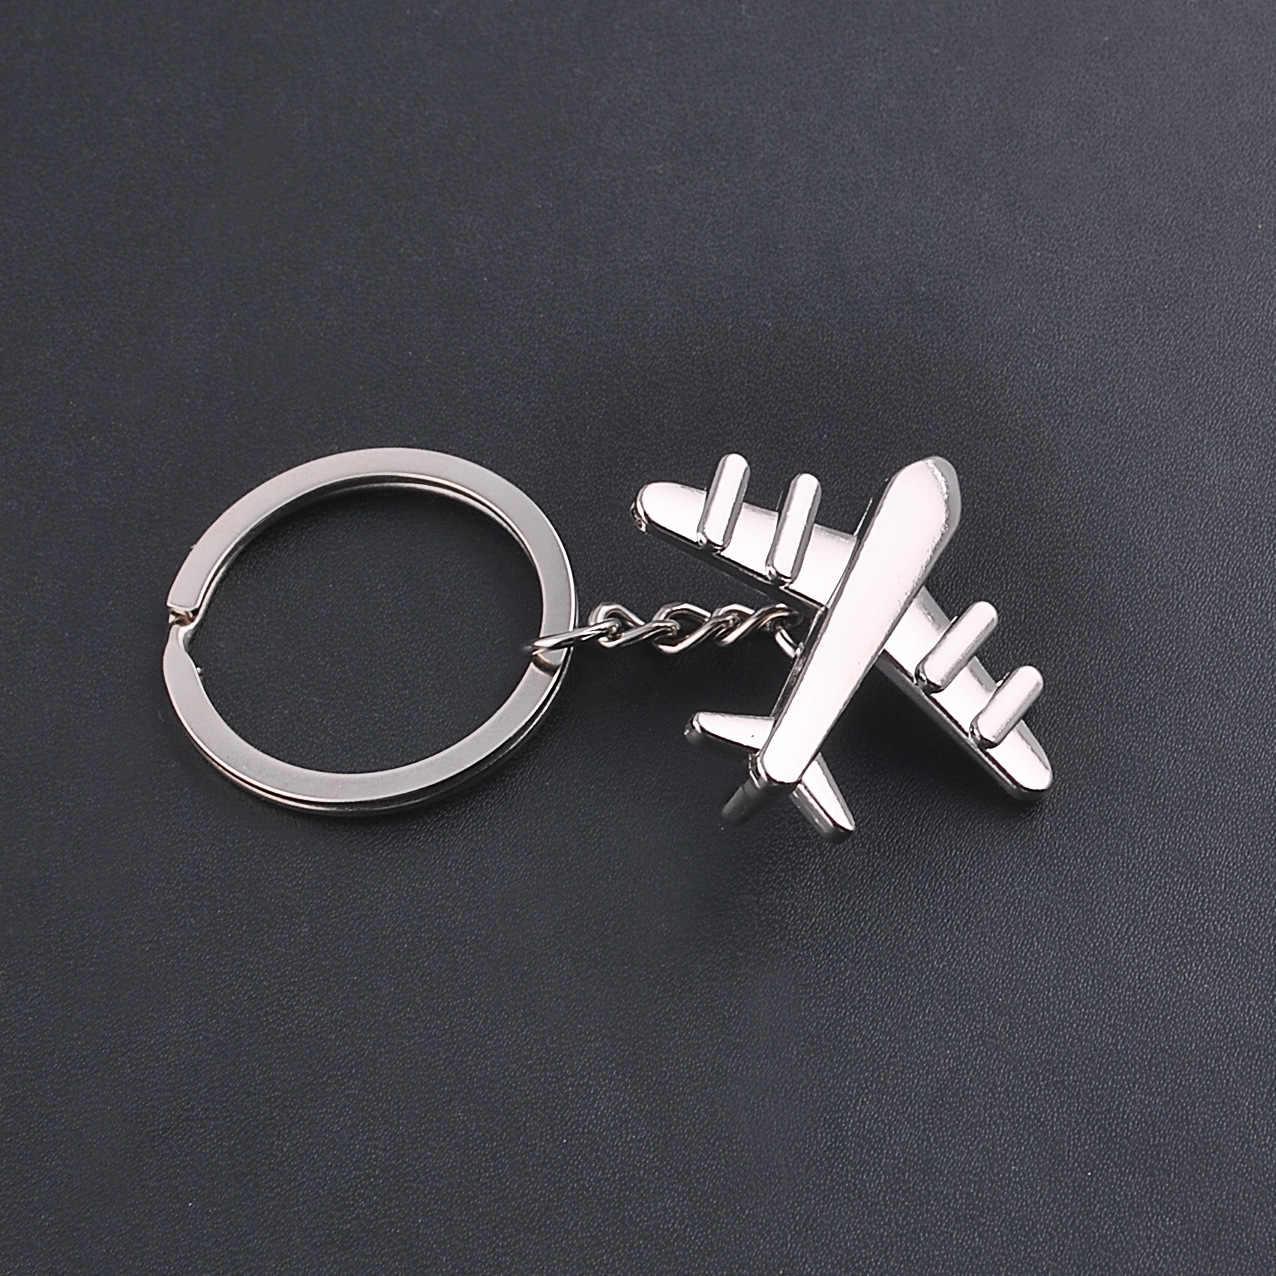 ... Keychain Modern Fighter Aircraft Airplane Key Chain Mini aircraft Key  Ring Bag Pendant Car Keyring For 79f890857